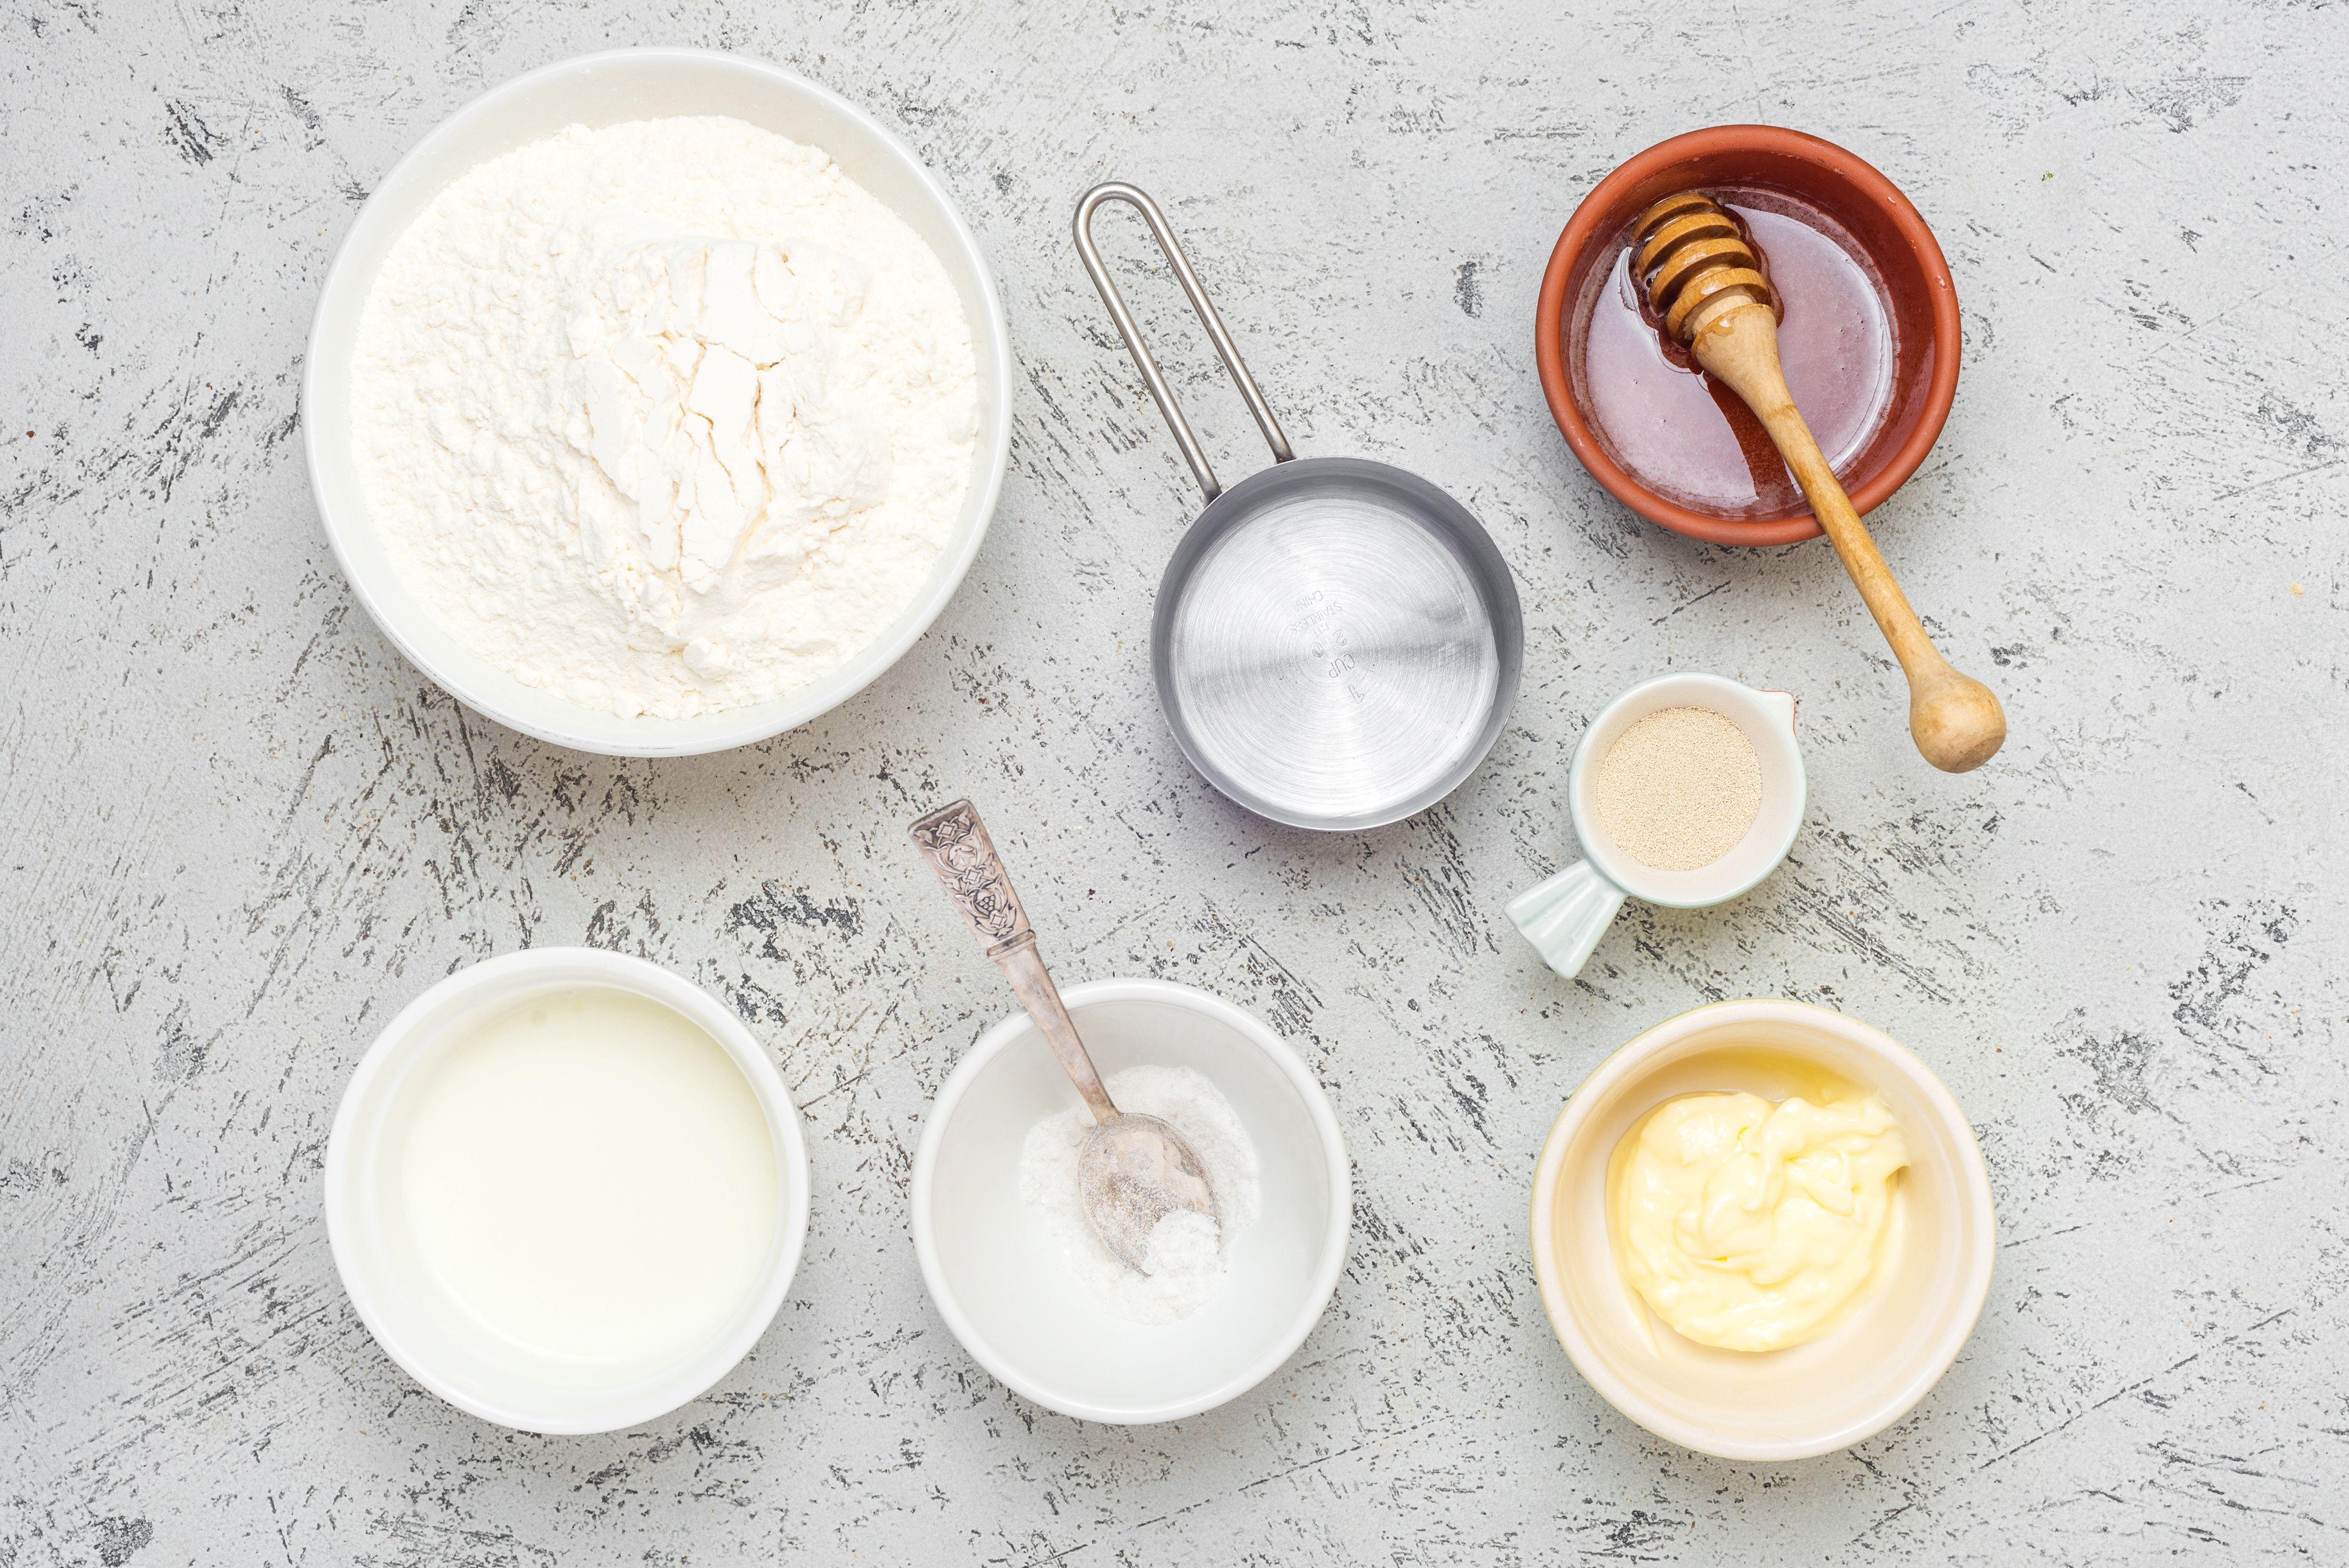 Ingredients for honey buttermilk bread